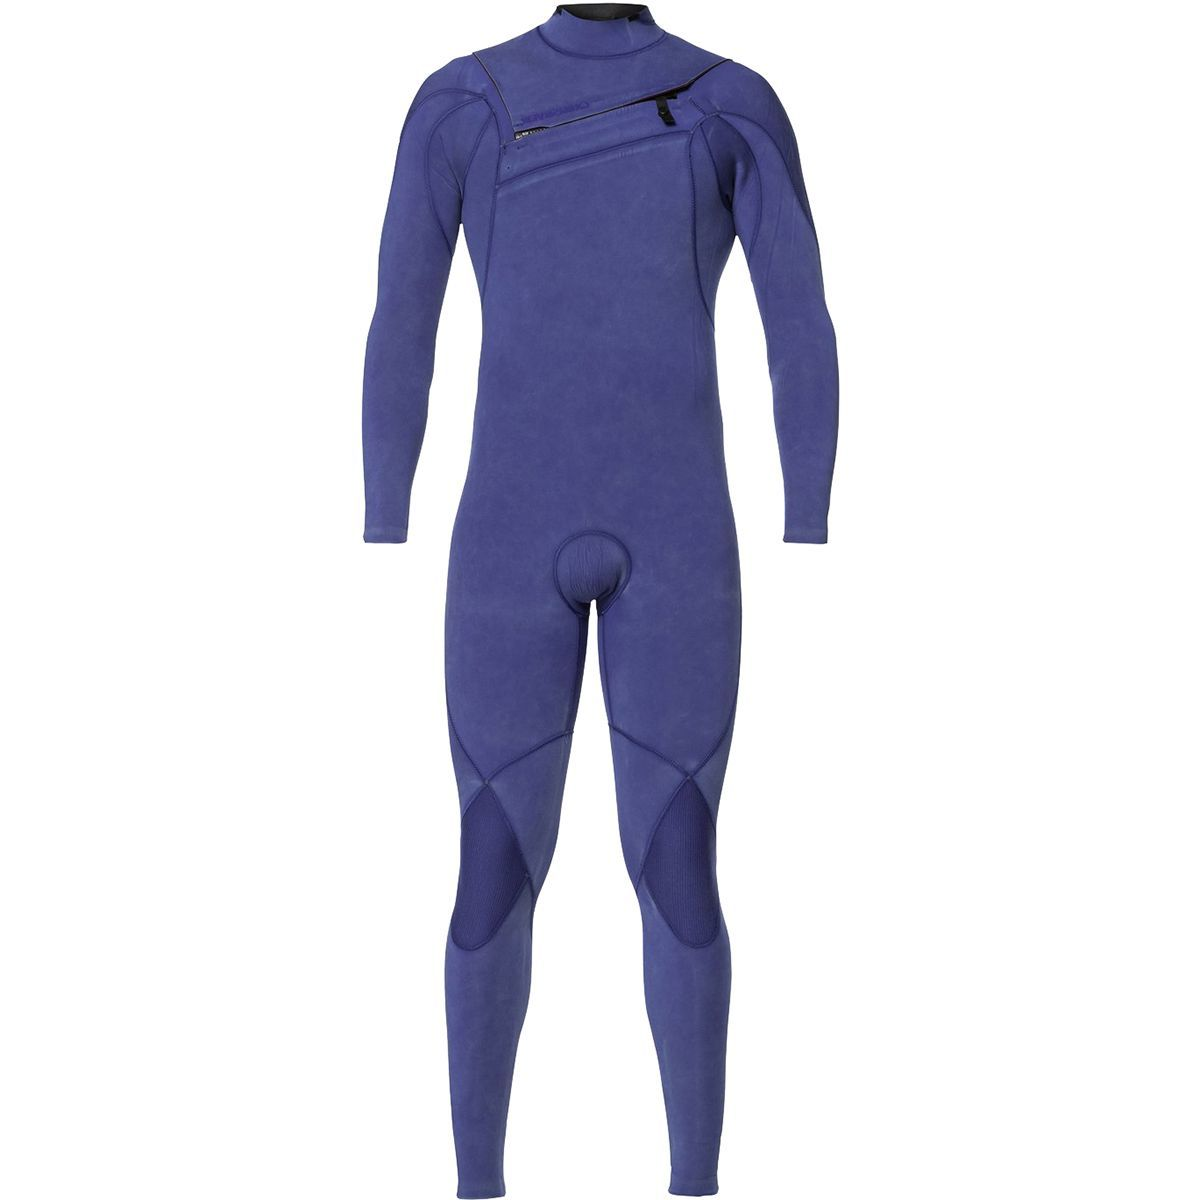 Quiksilver 3/2 Highline Limited Monochrome Chest-Zip Wetsuit - Men's